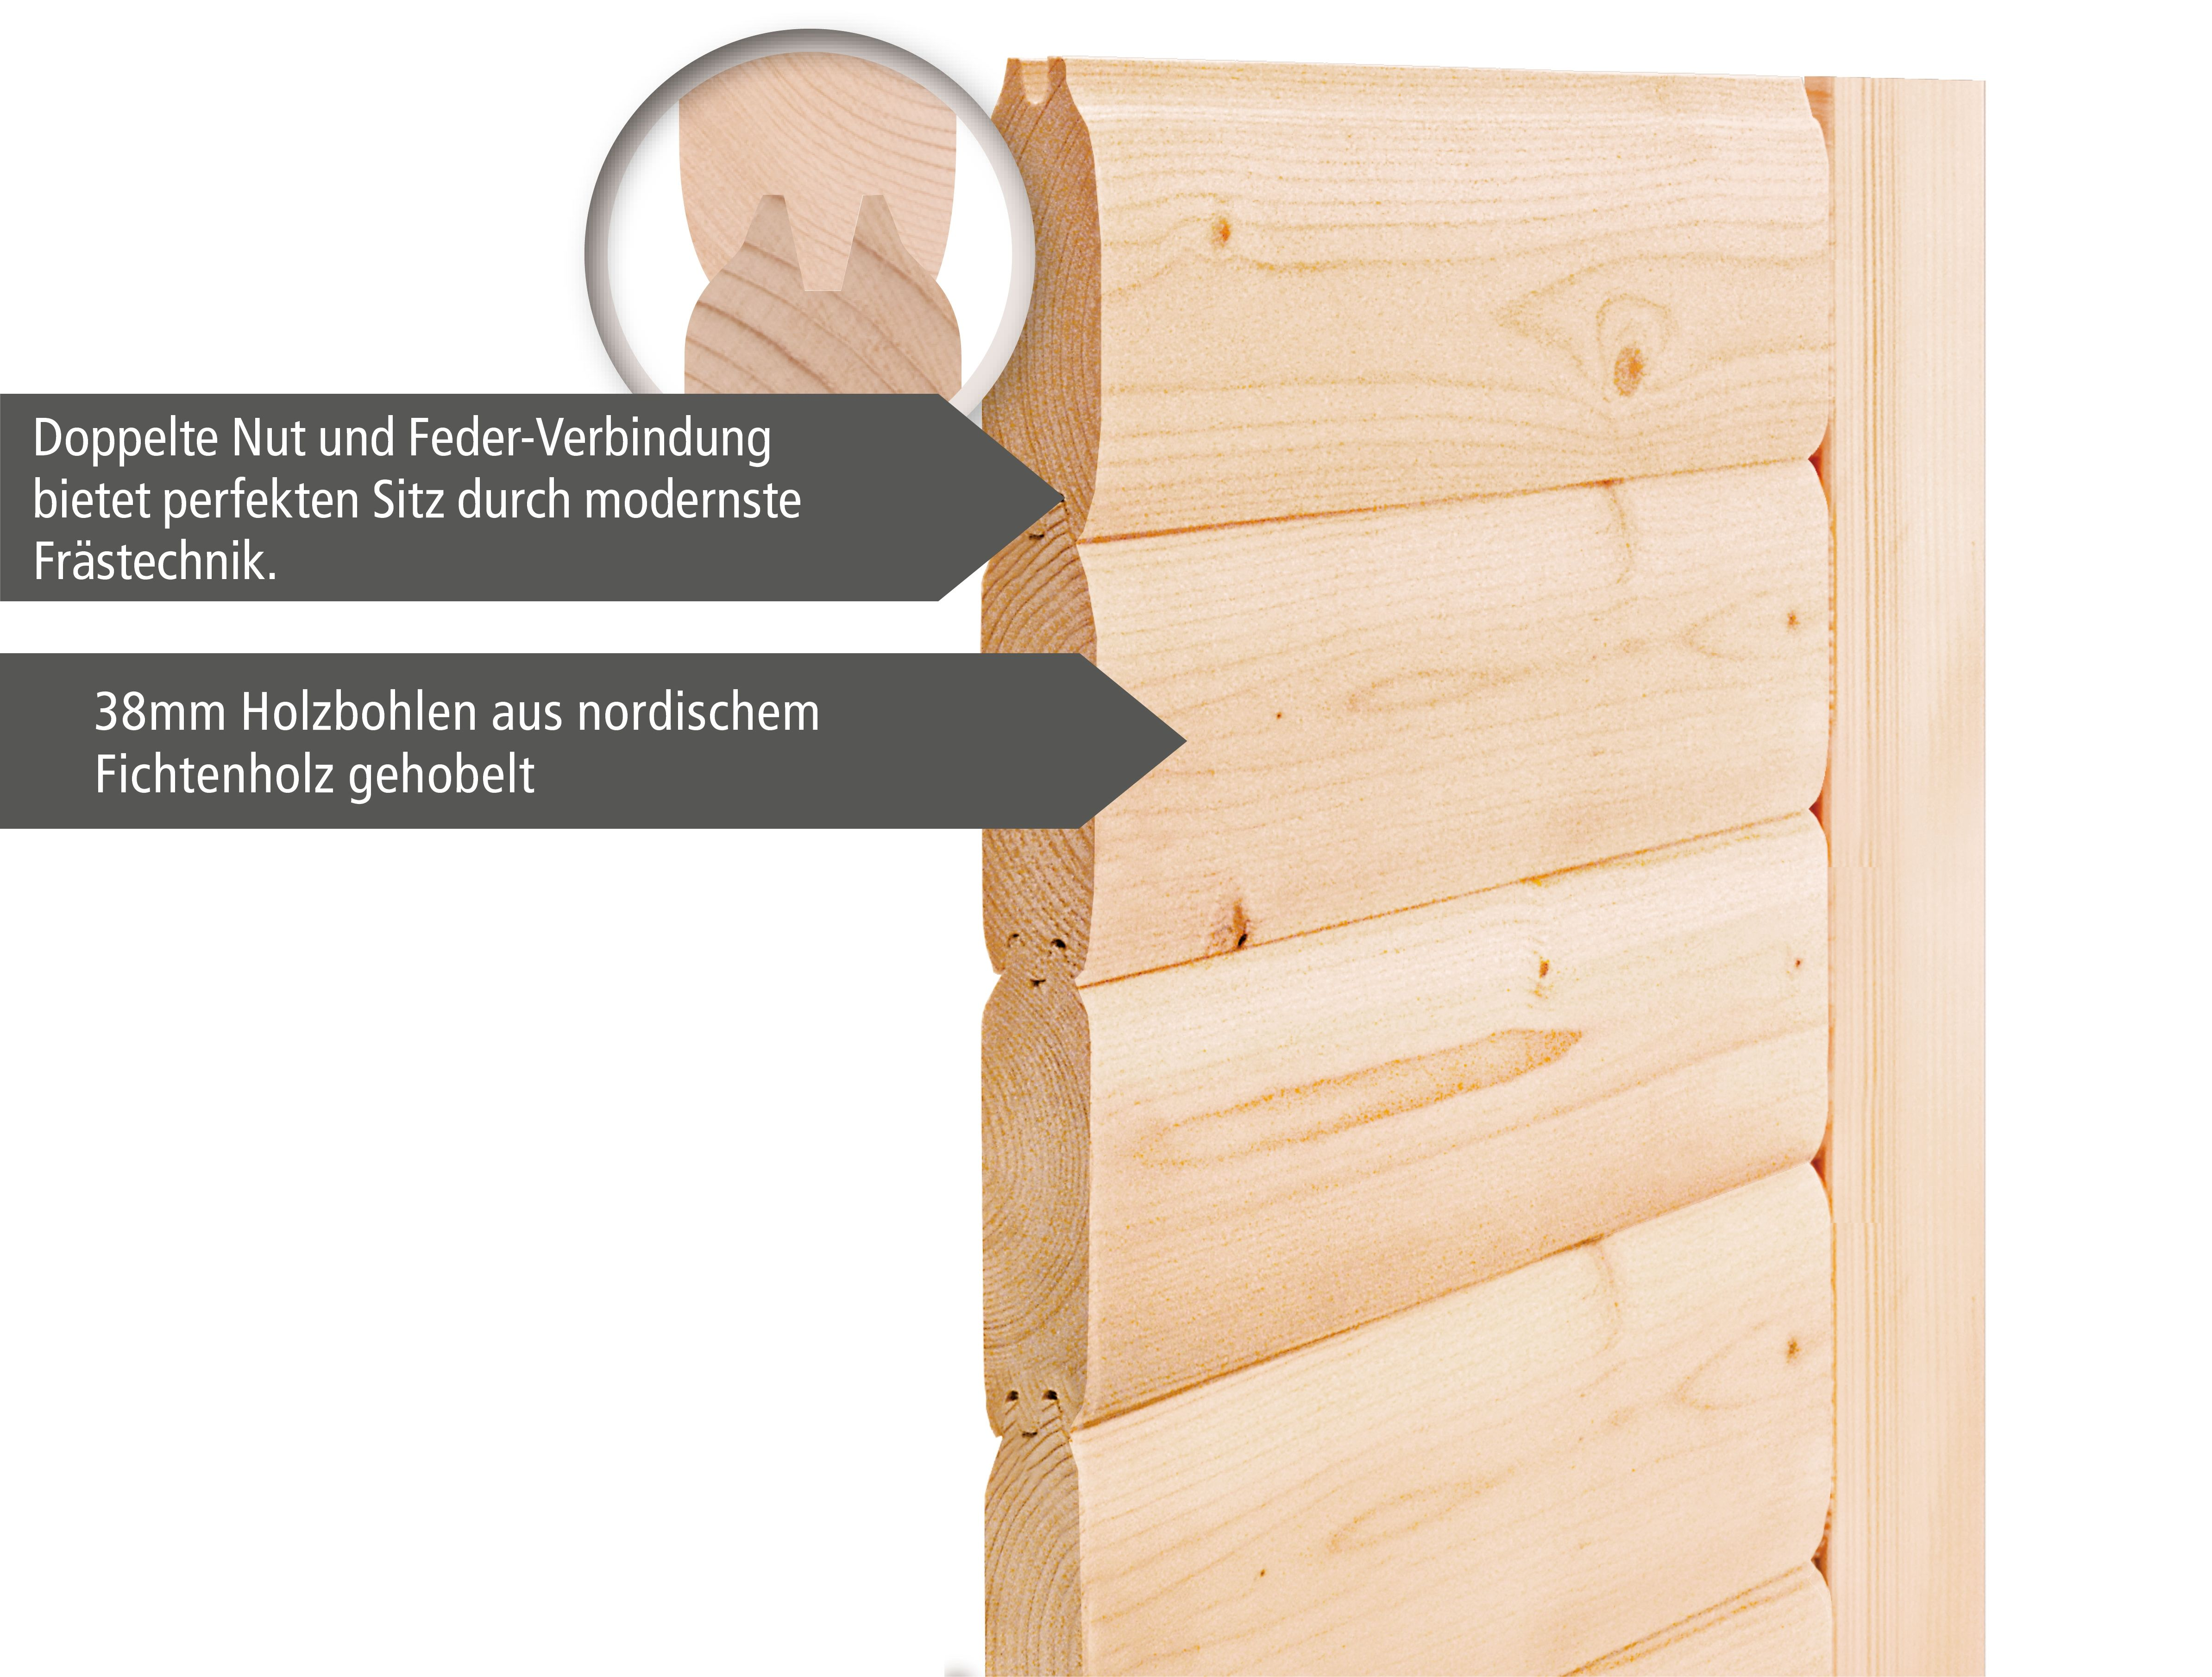 Woodfeeling Sauna Lisa 38mm Ofen 9kW extern Tür Holz Bild 7